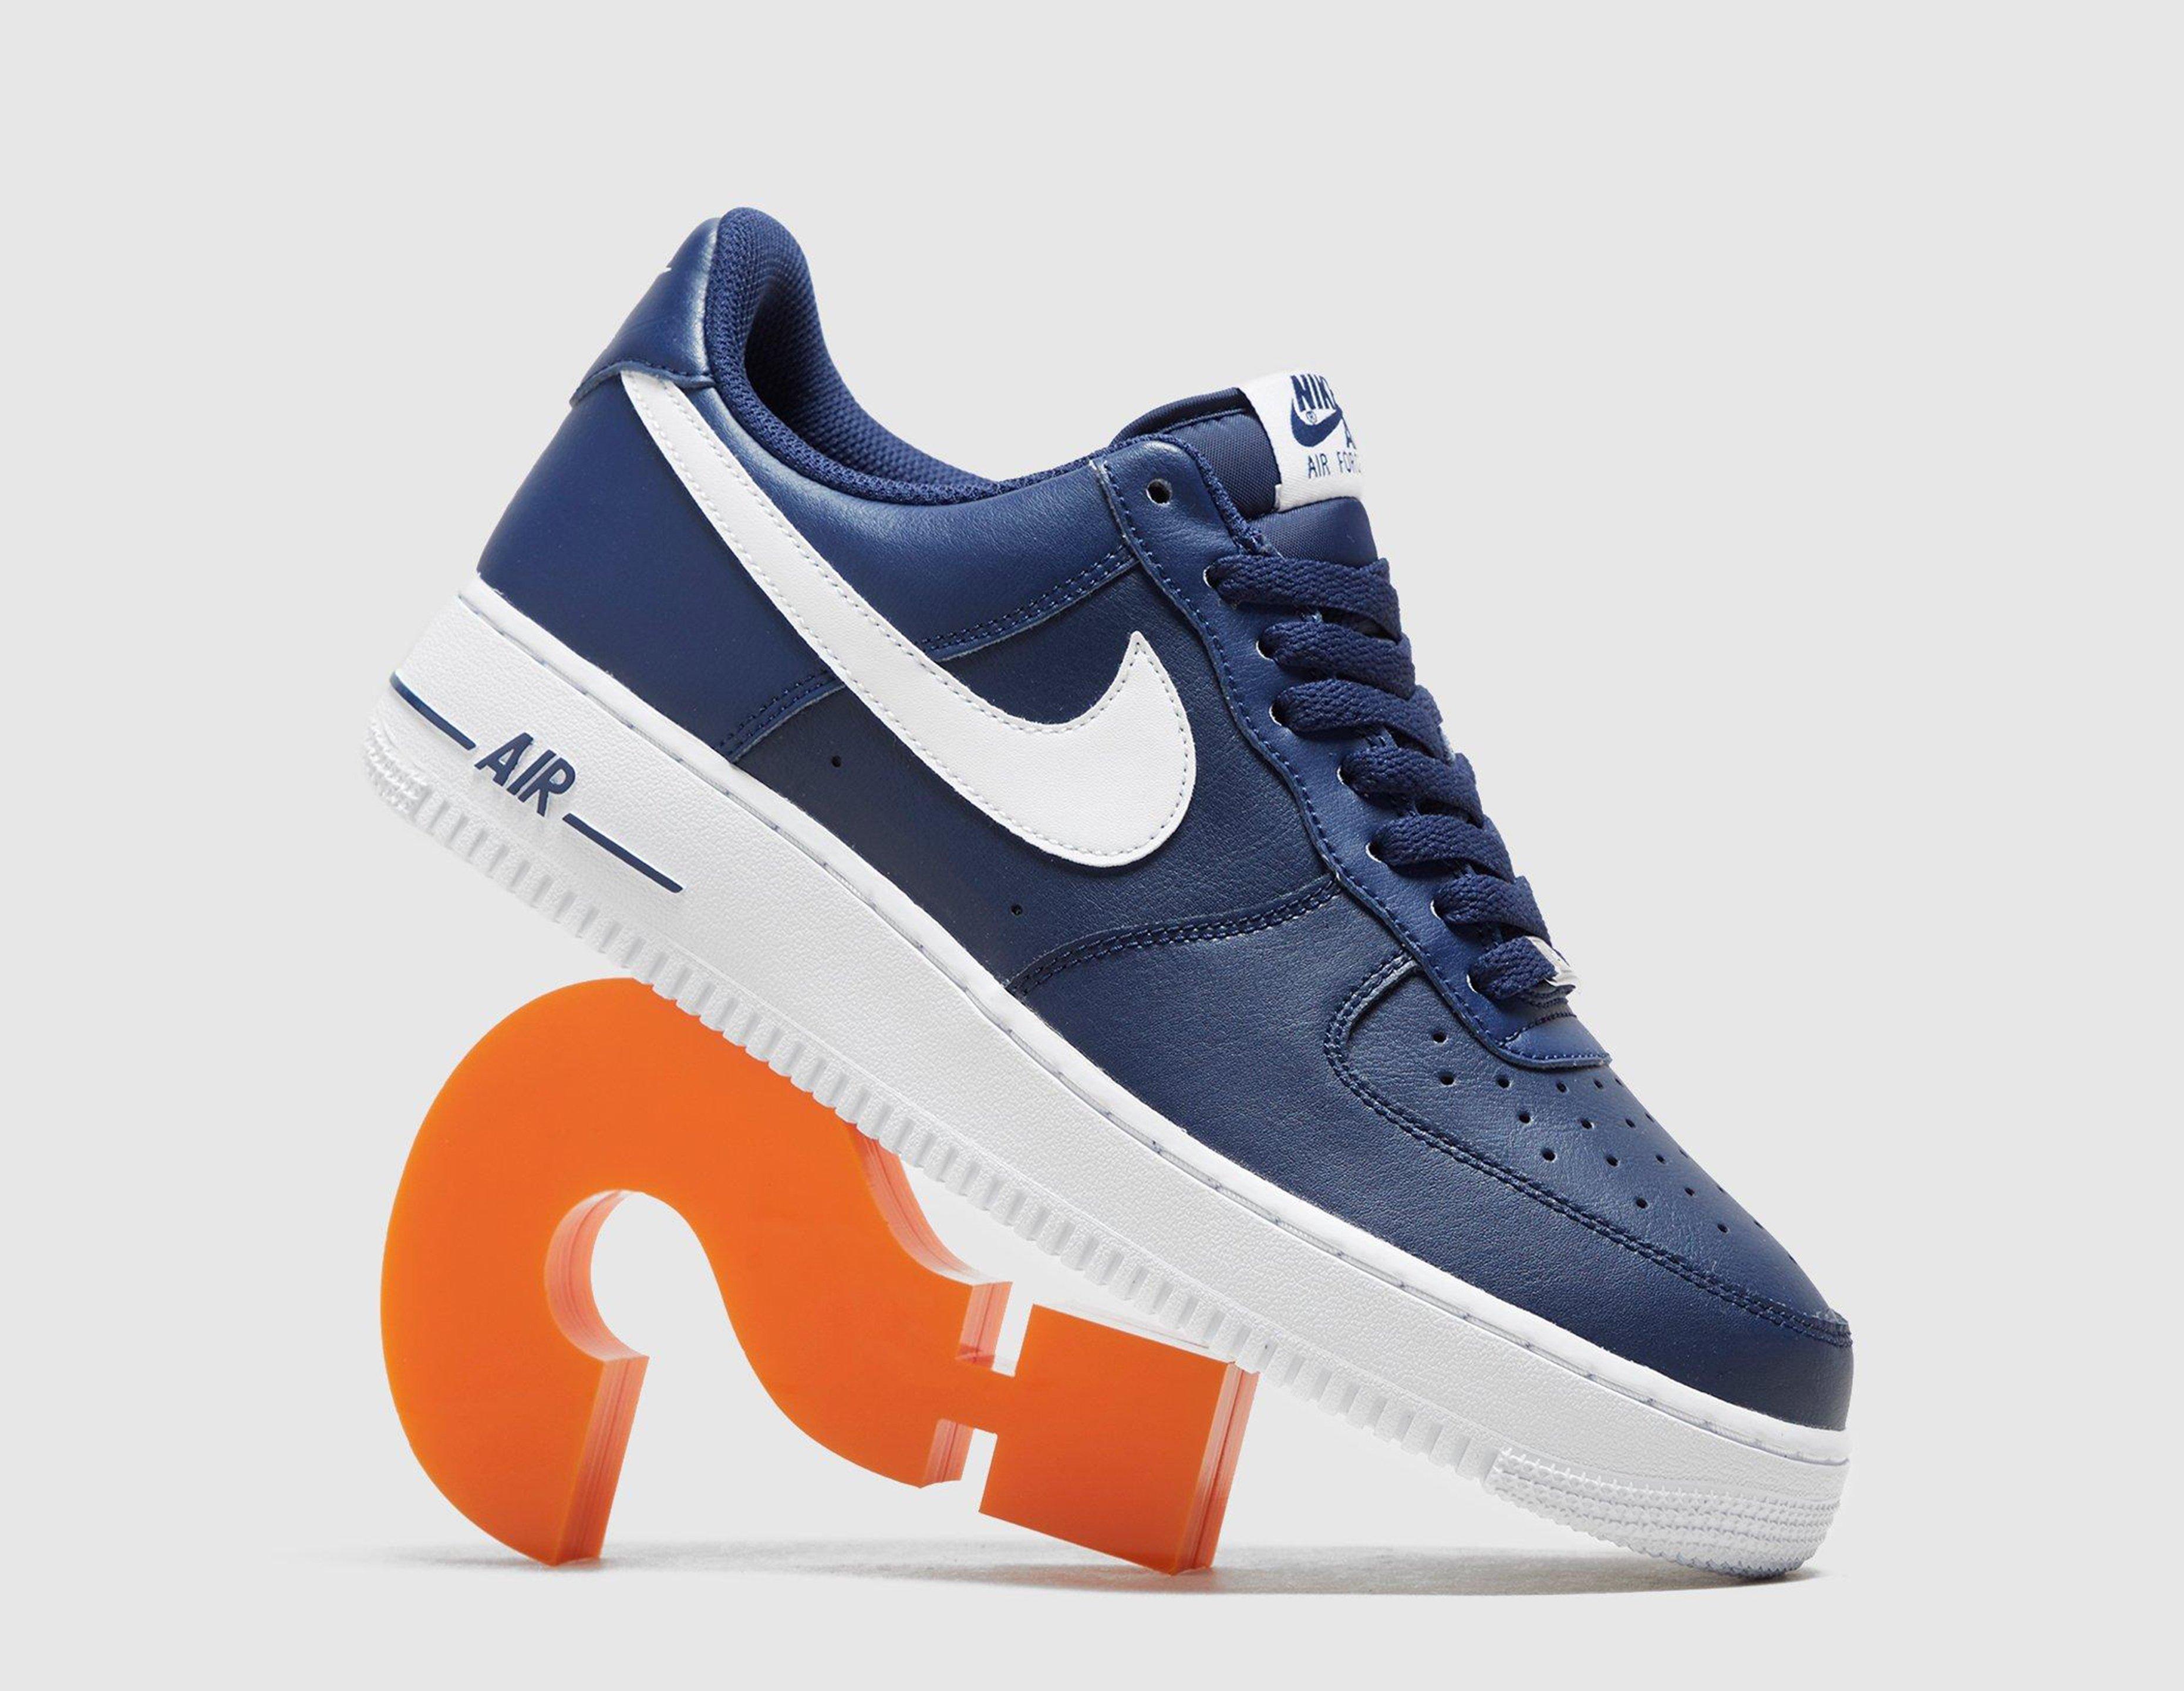 Nike Air Force 1 '07 Low Essential Størrelse?  Size?